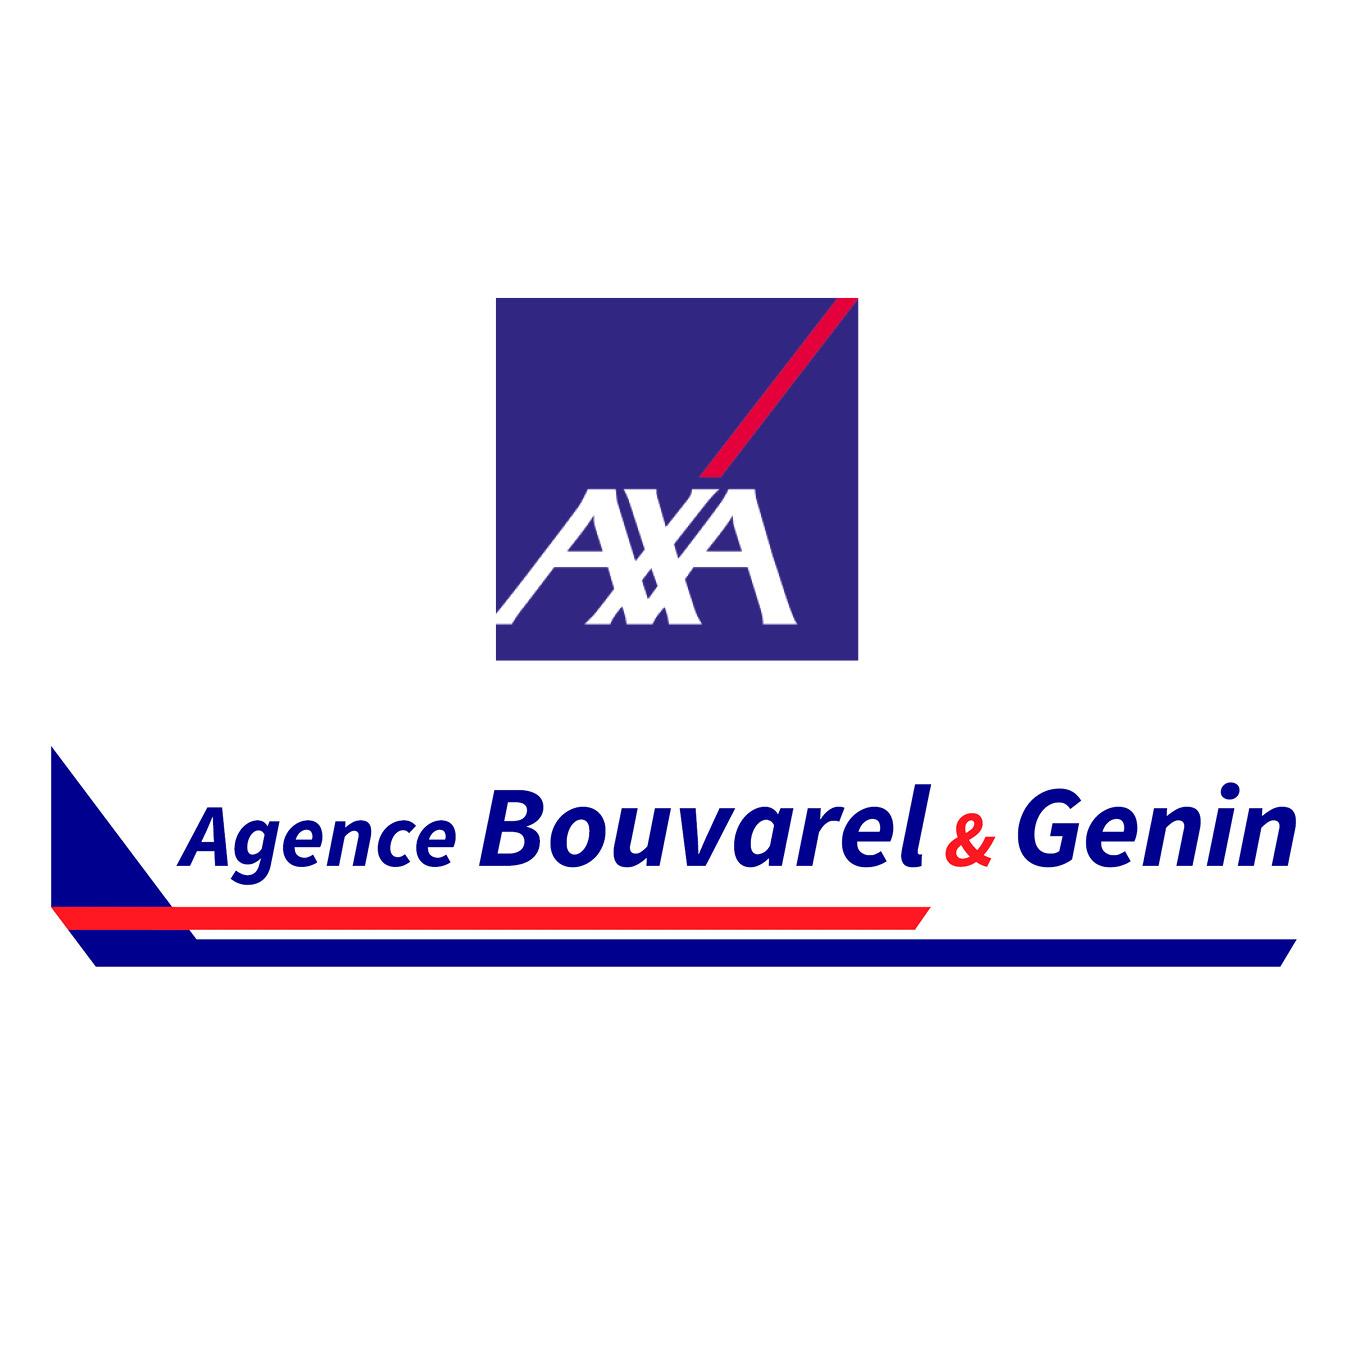 AXA Agence Bouvarel & Genin